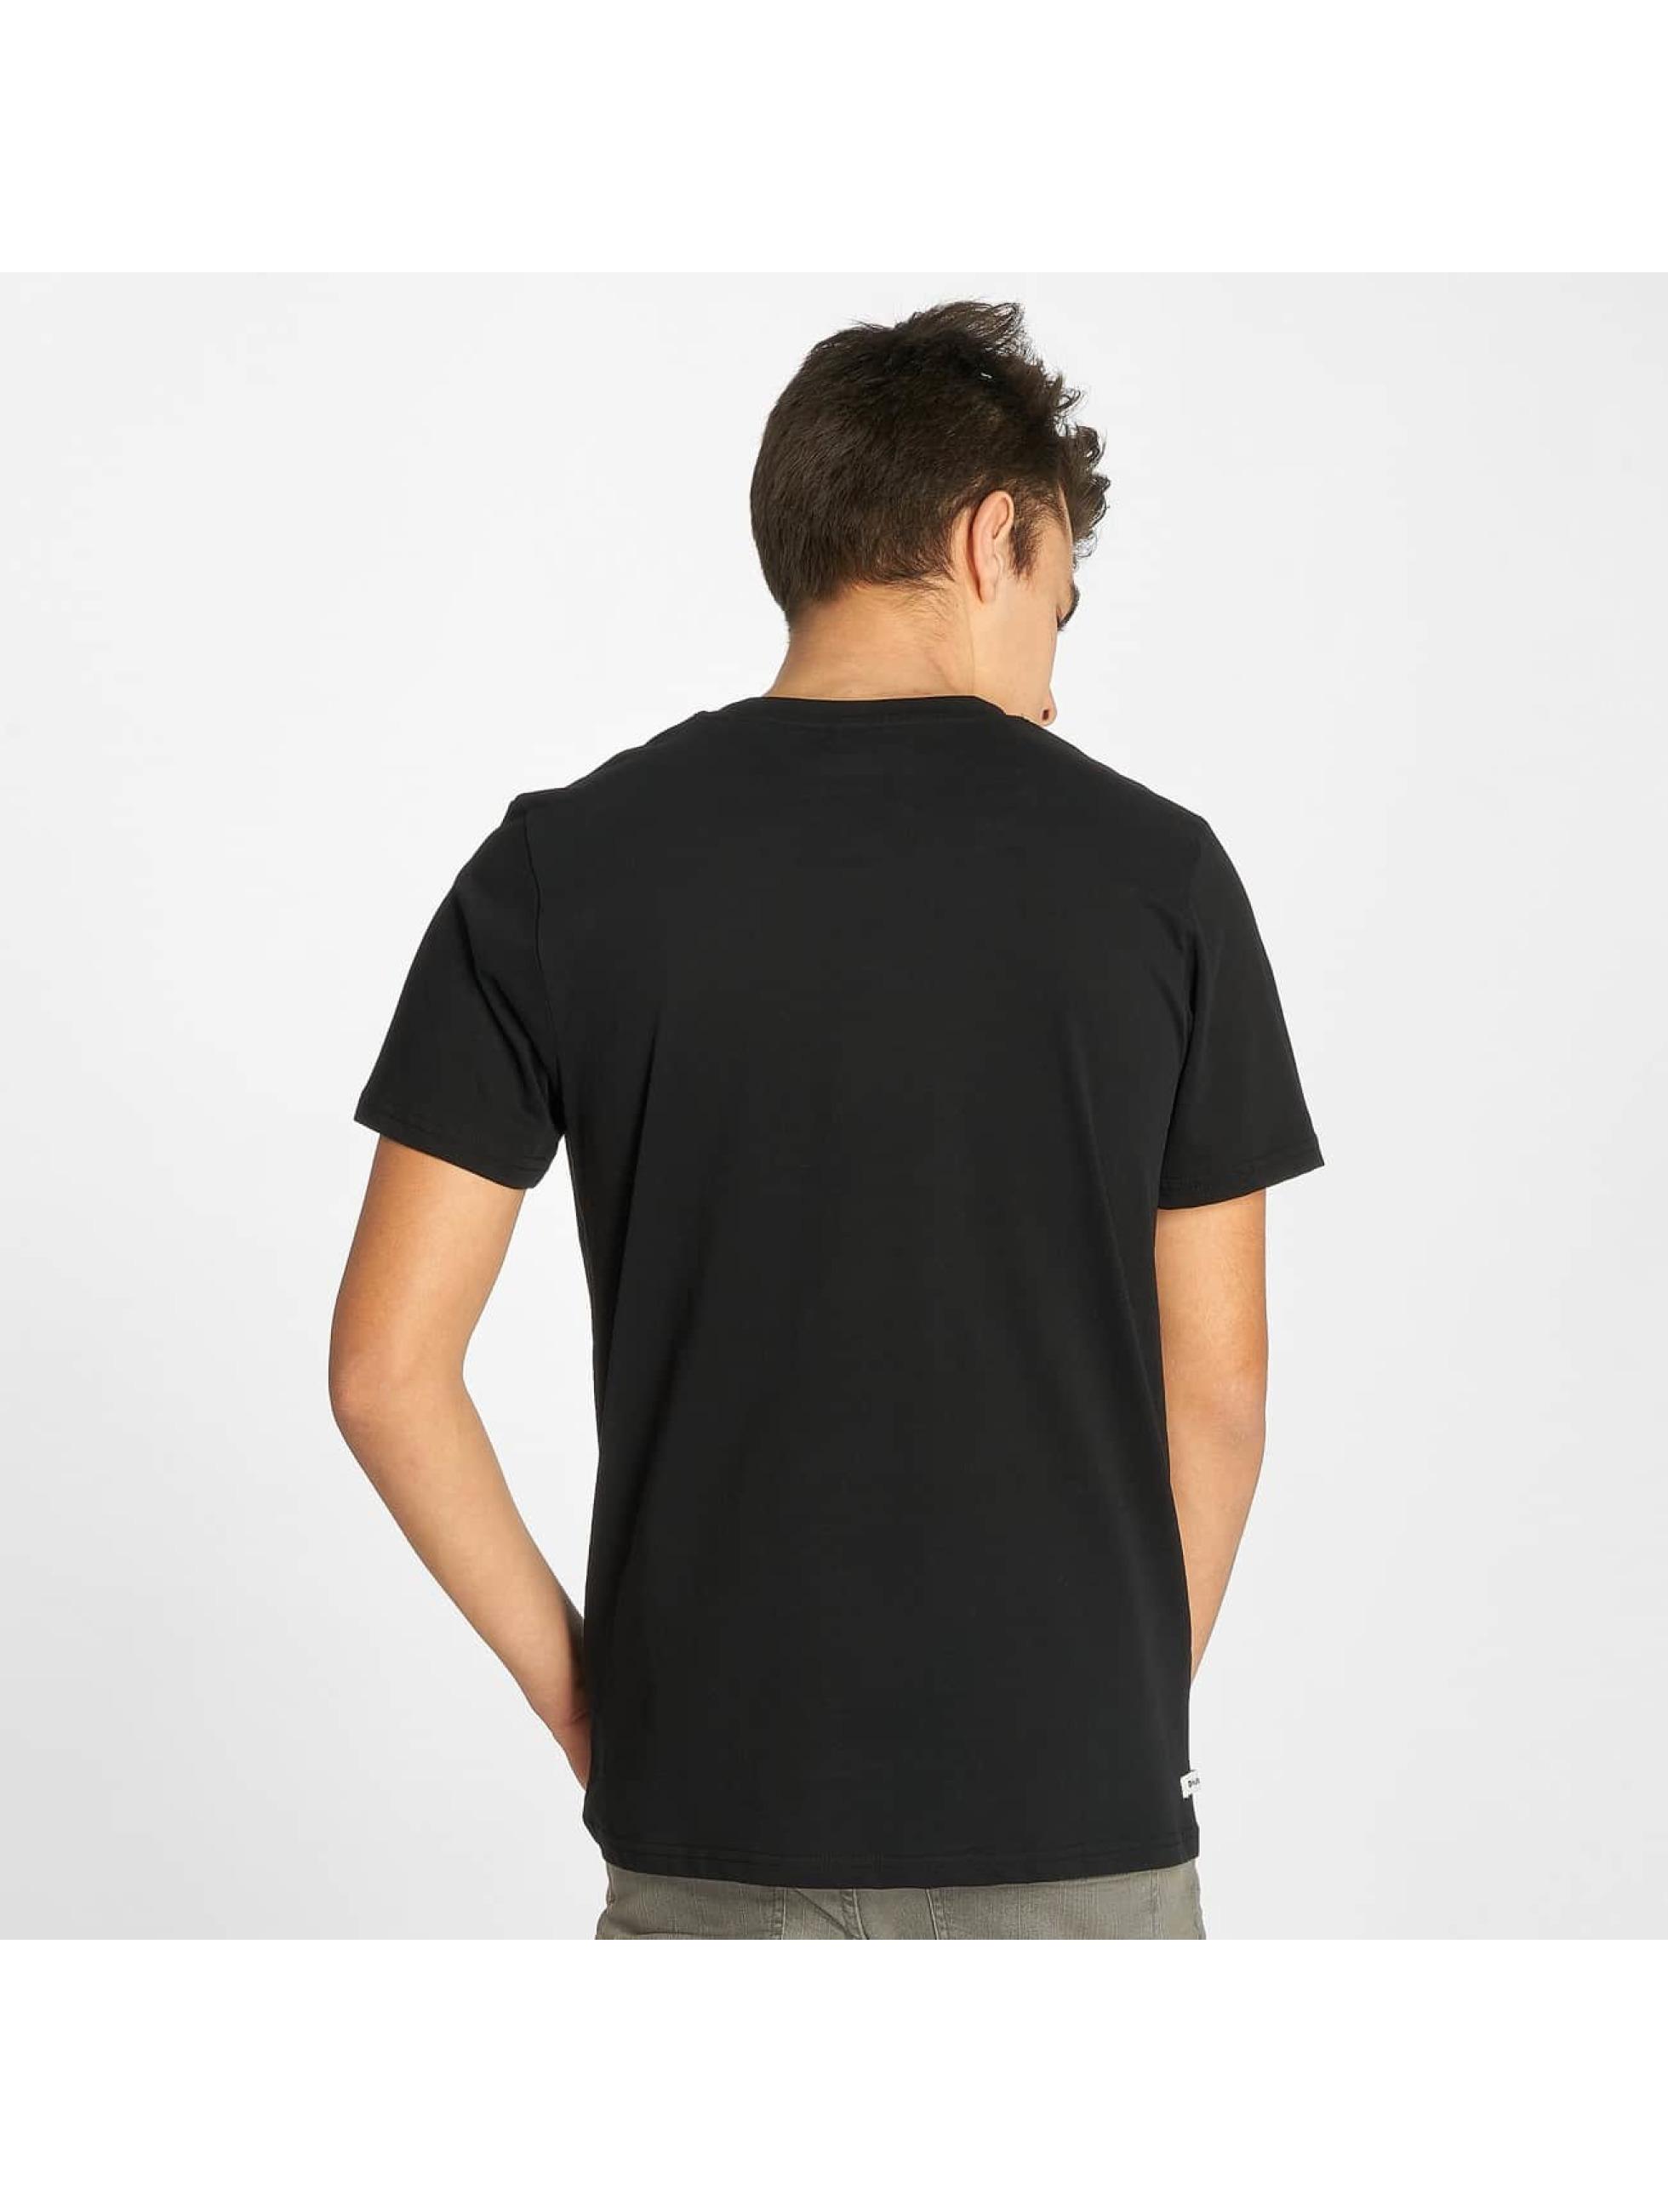 Kulte T-shirt Discovery svart